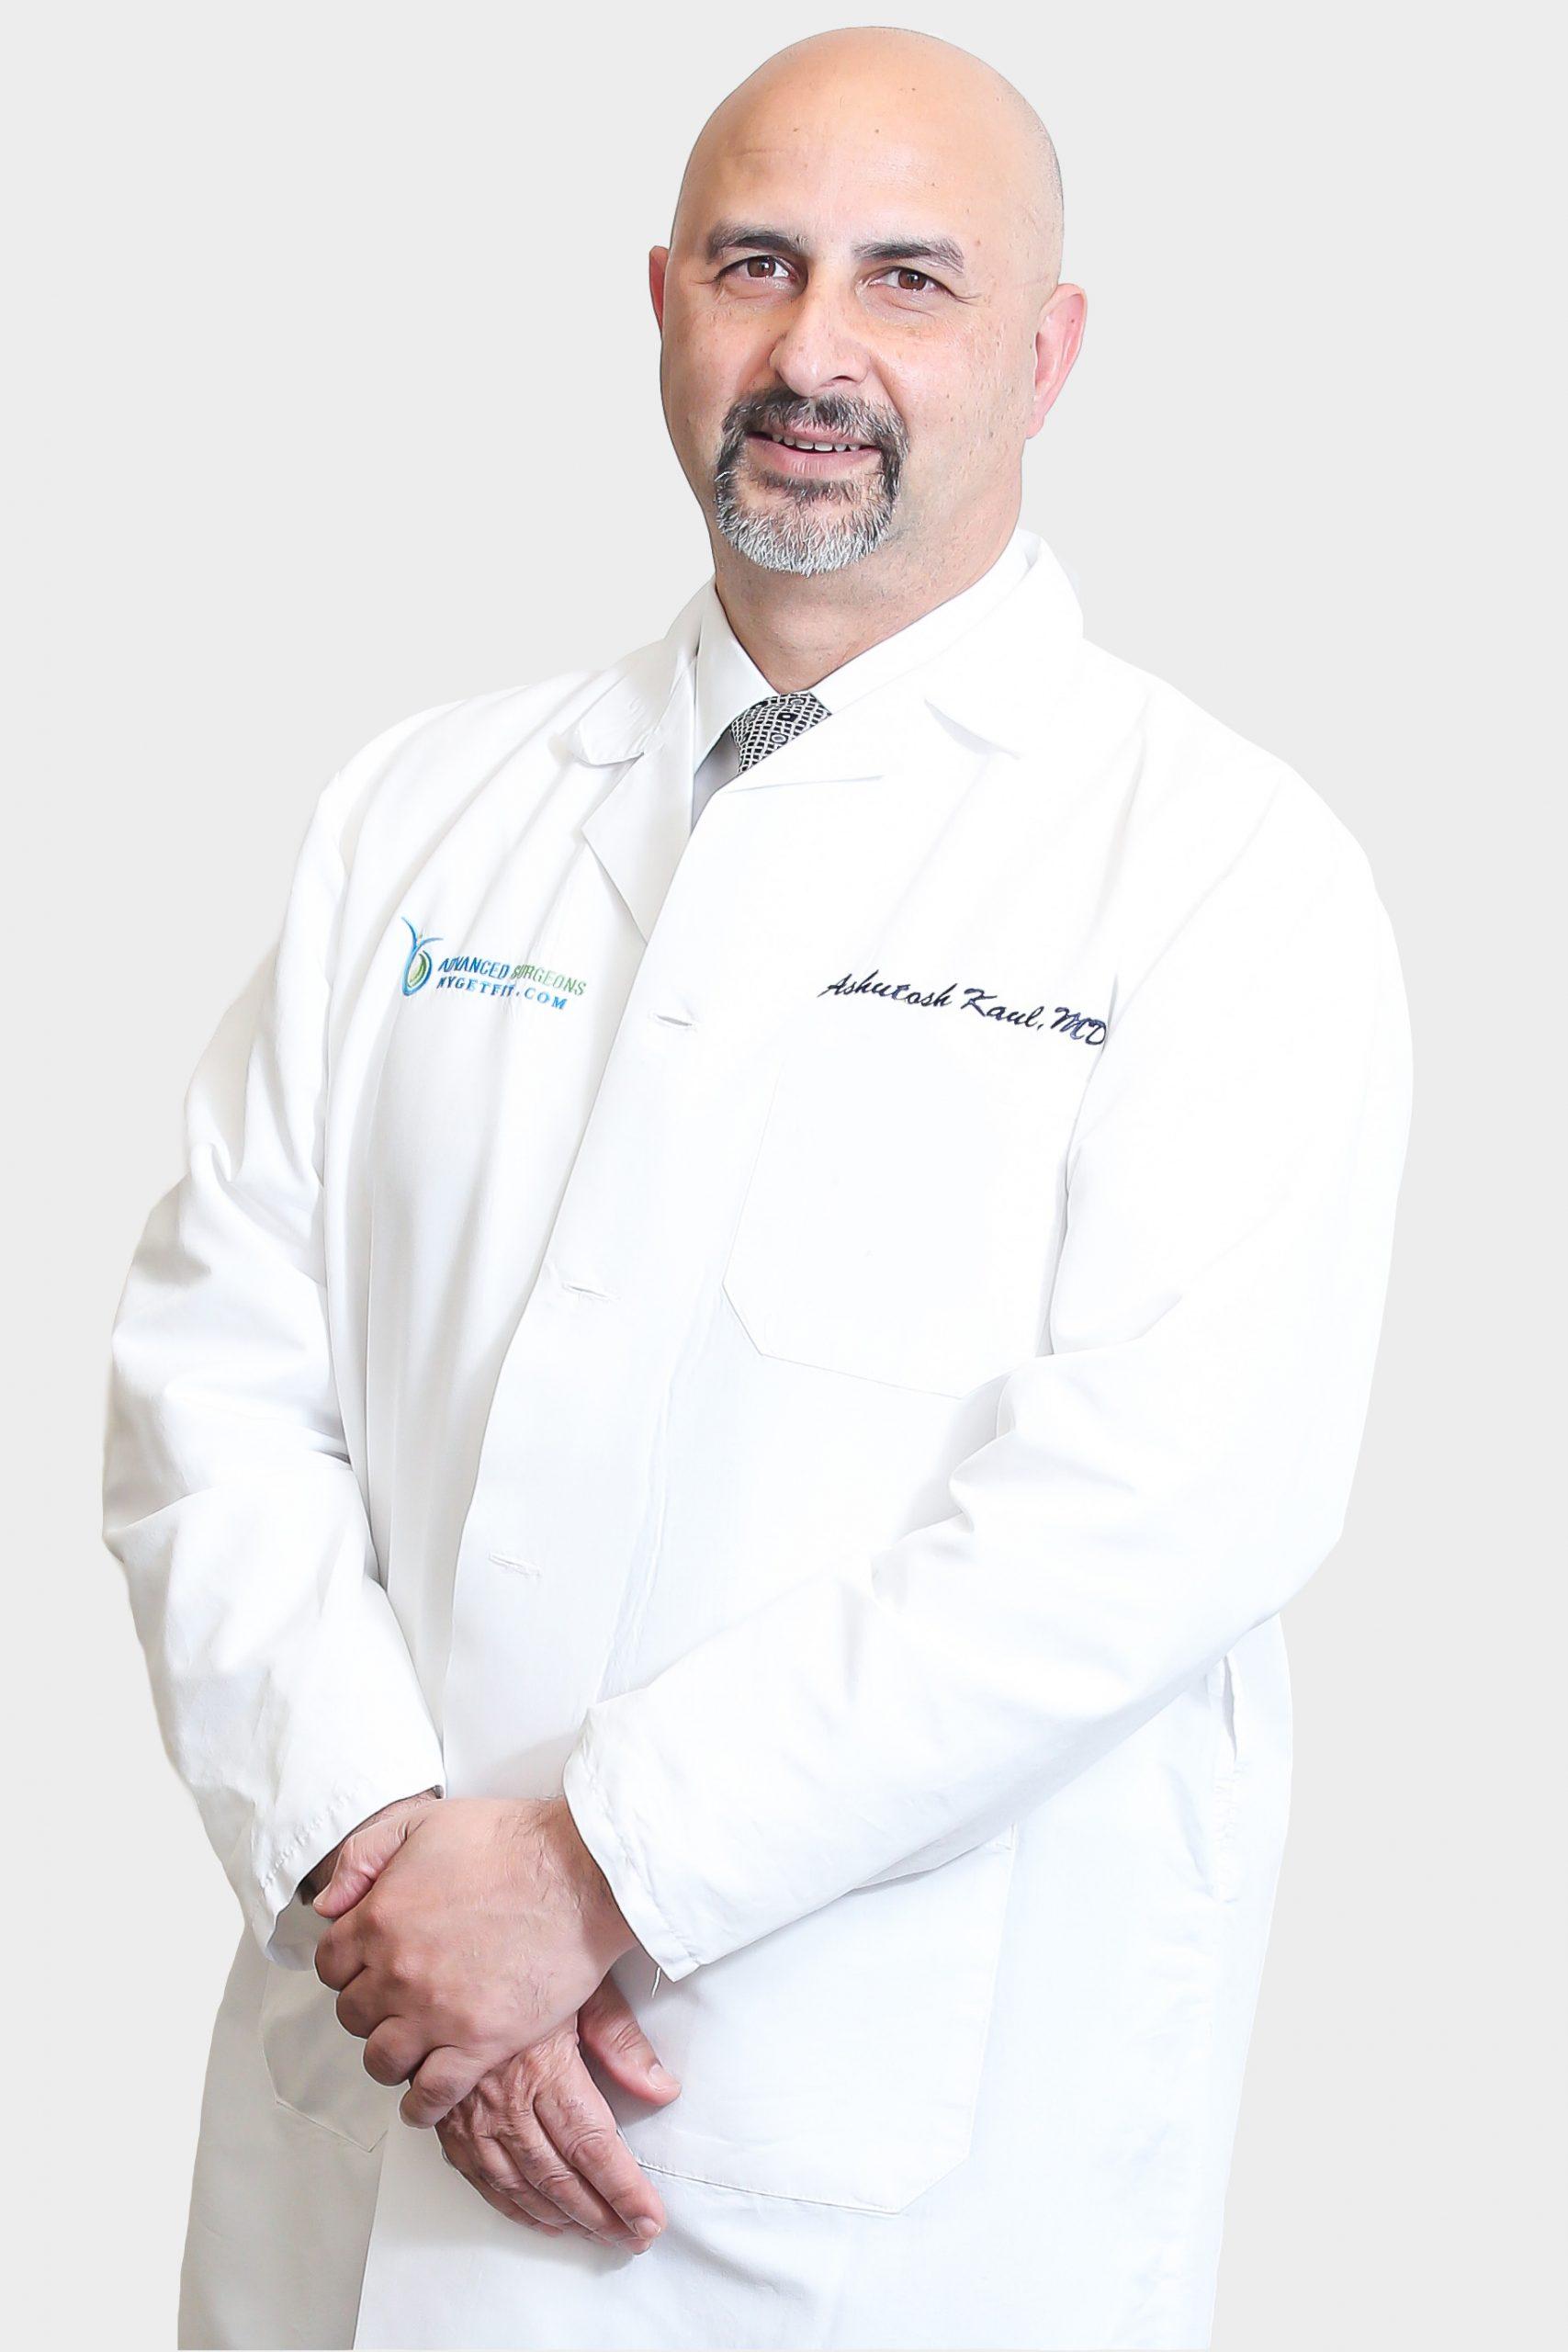 Dr. Ashutosh Kaul, M.D